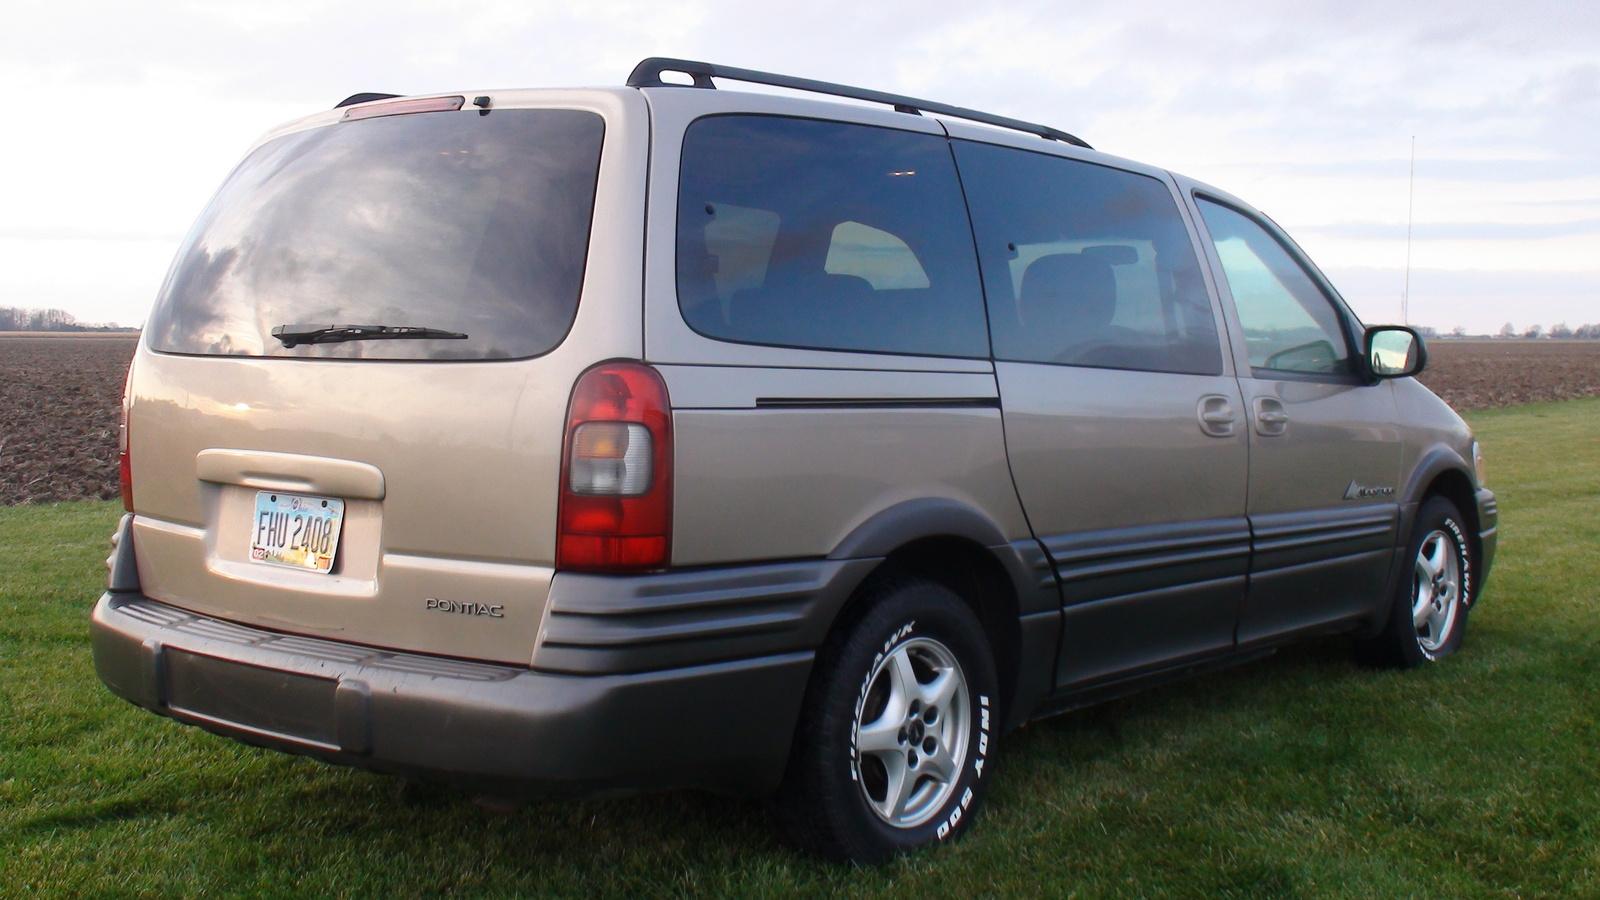 2004 Pontiac Montana - Pictures